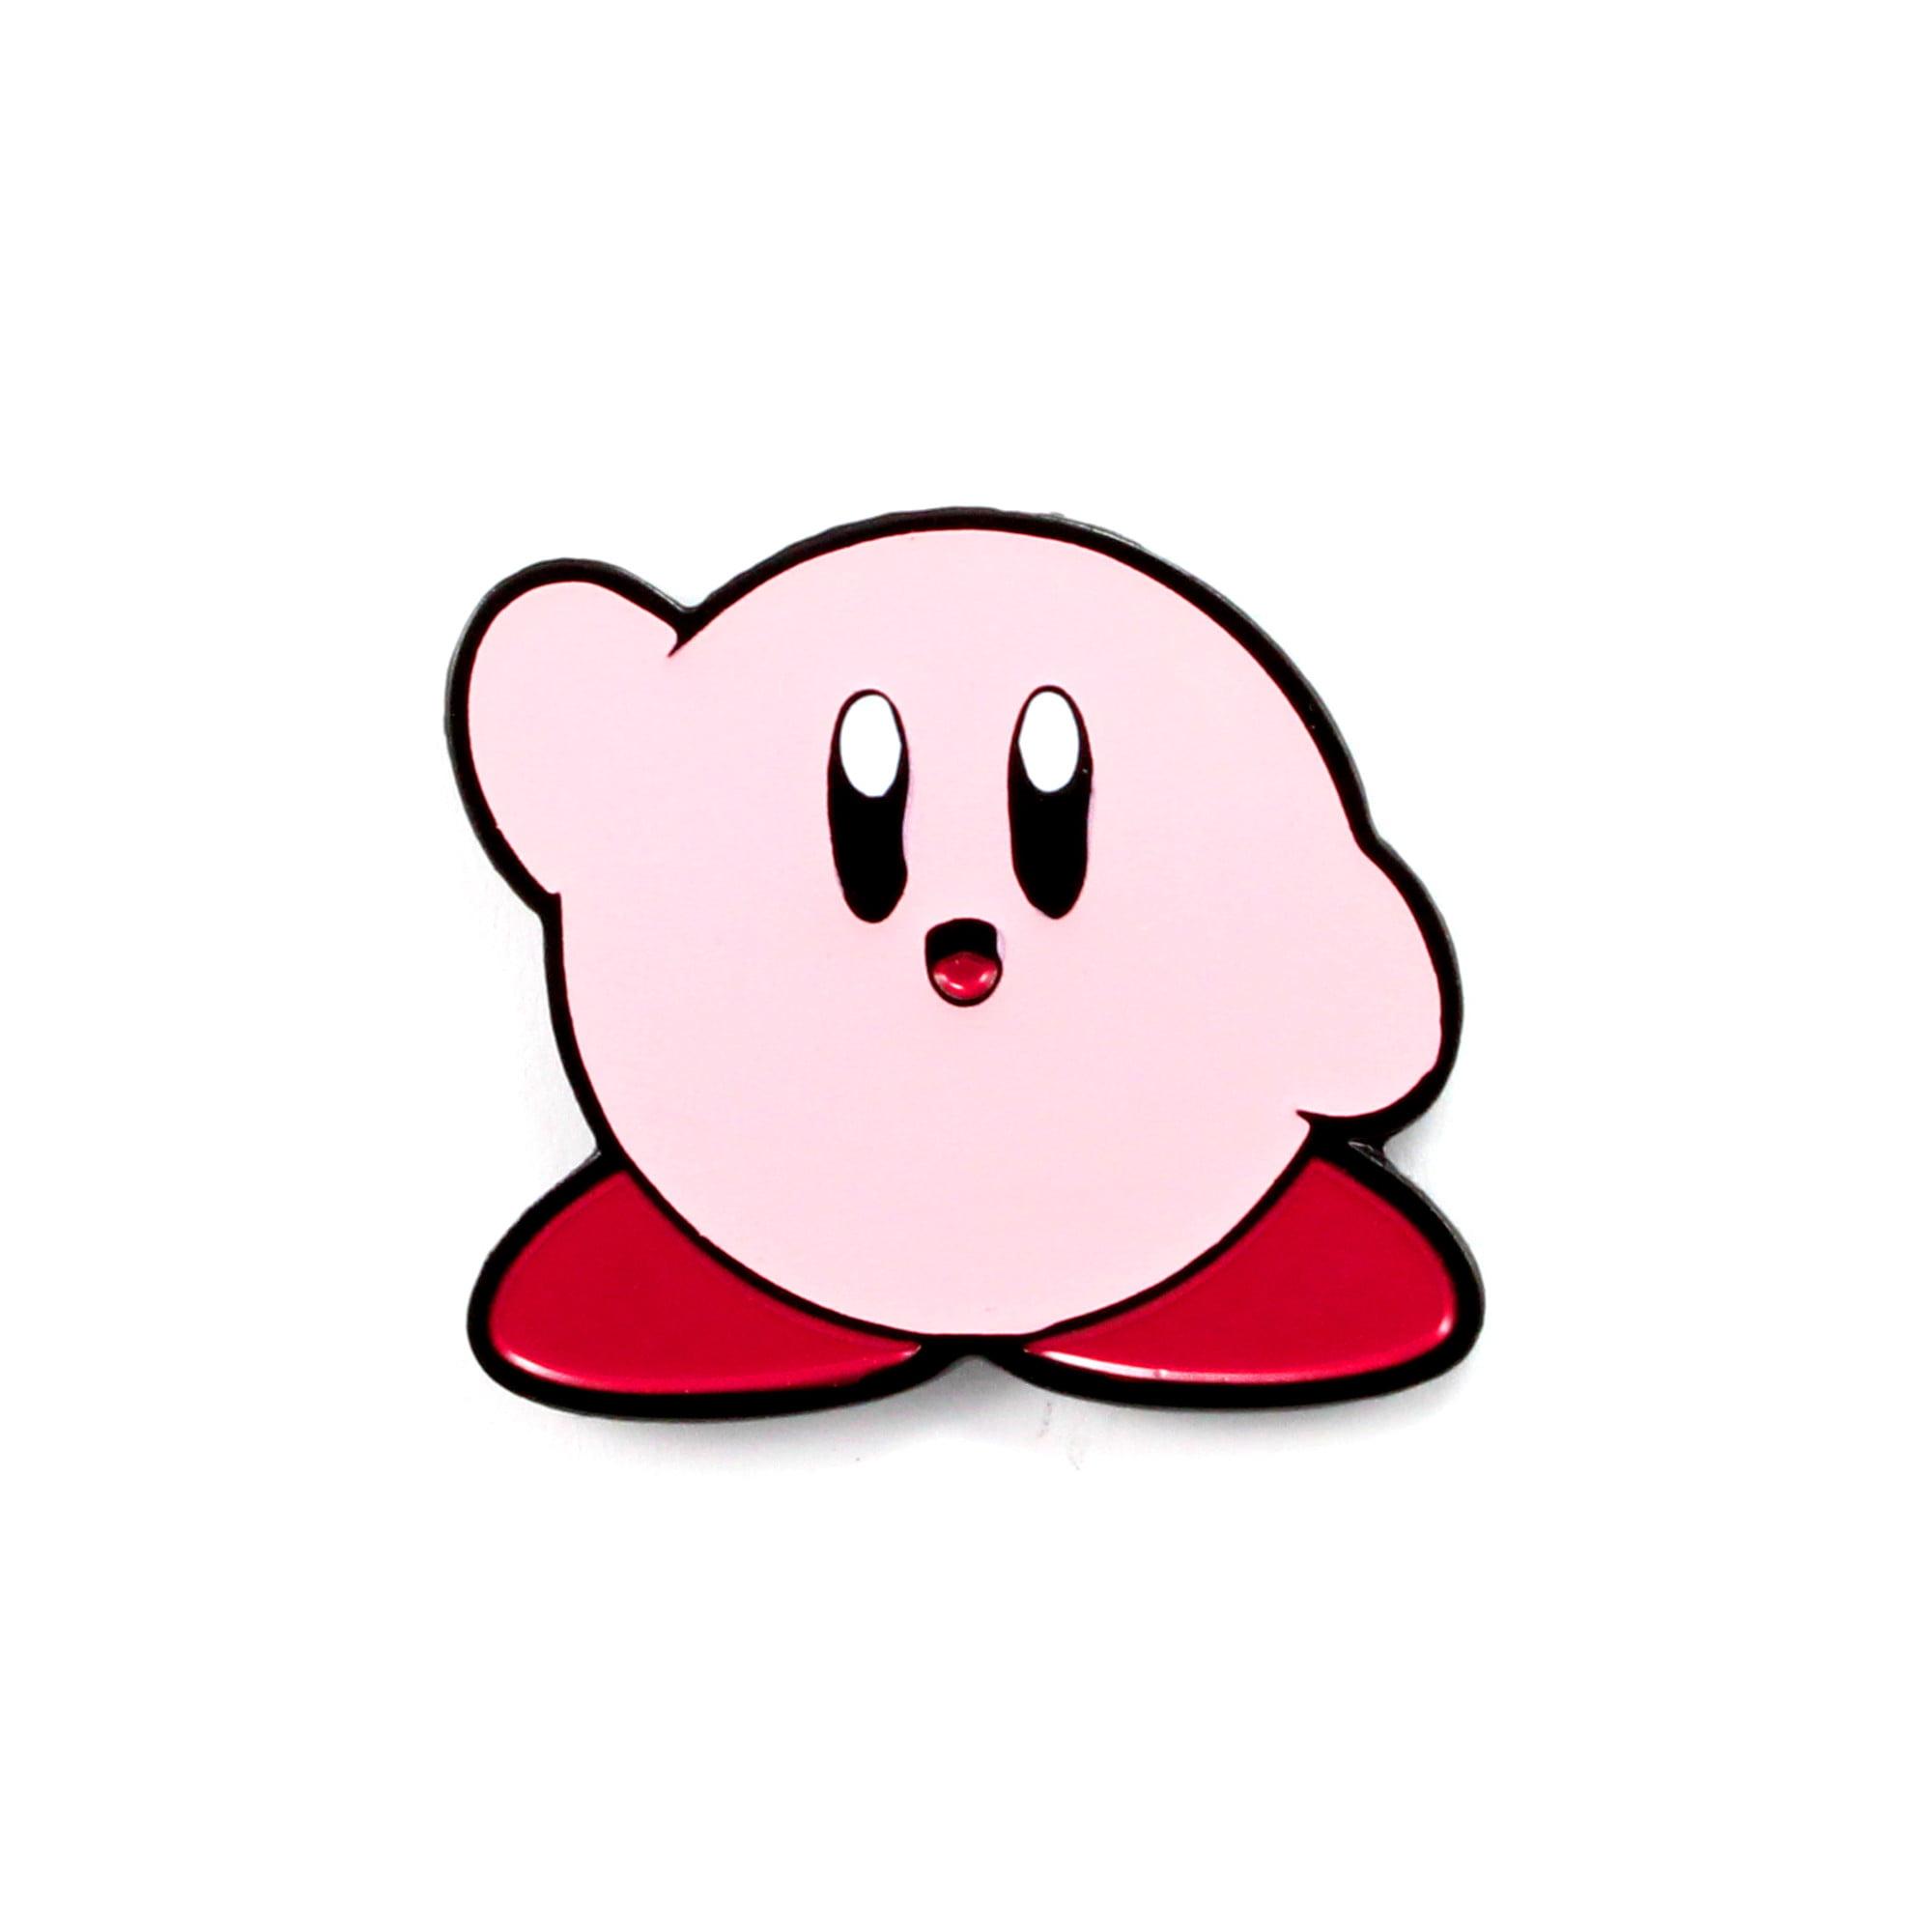 Cool Pins Cute Kirby Pin Nerdy Video Game Art Enamel Hat Pin Walmart Com Walmart Com